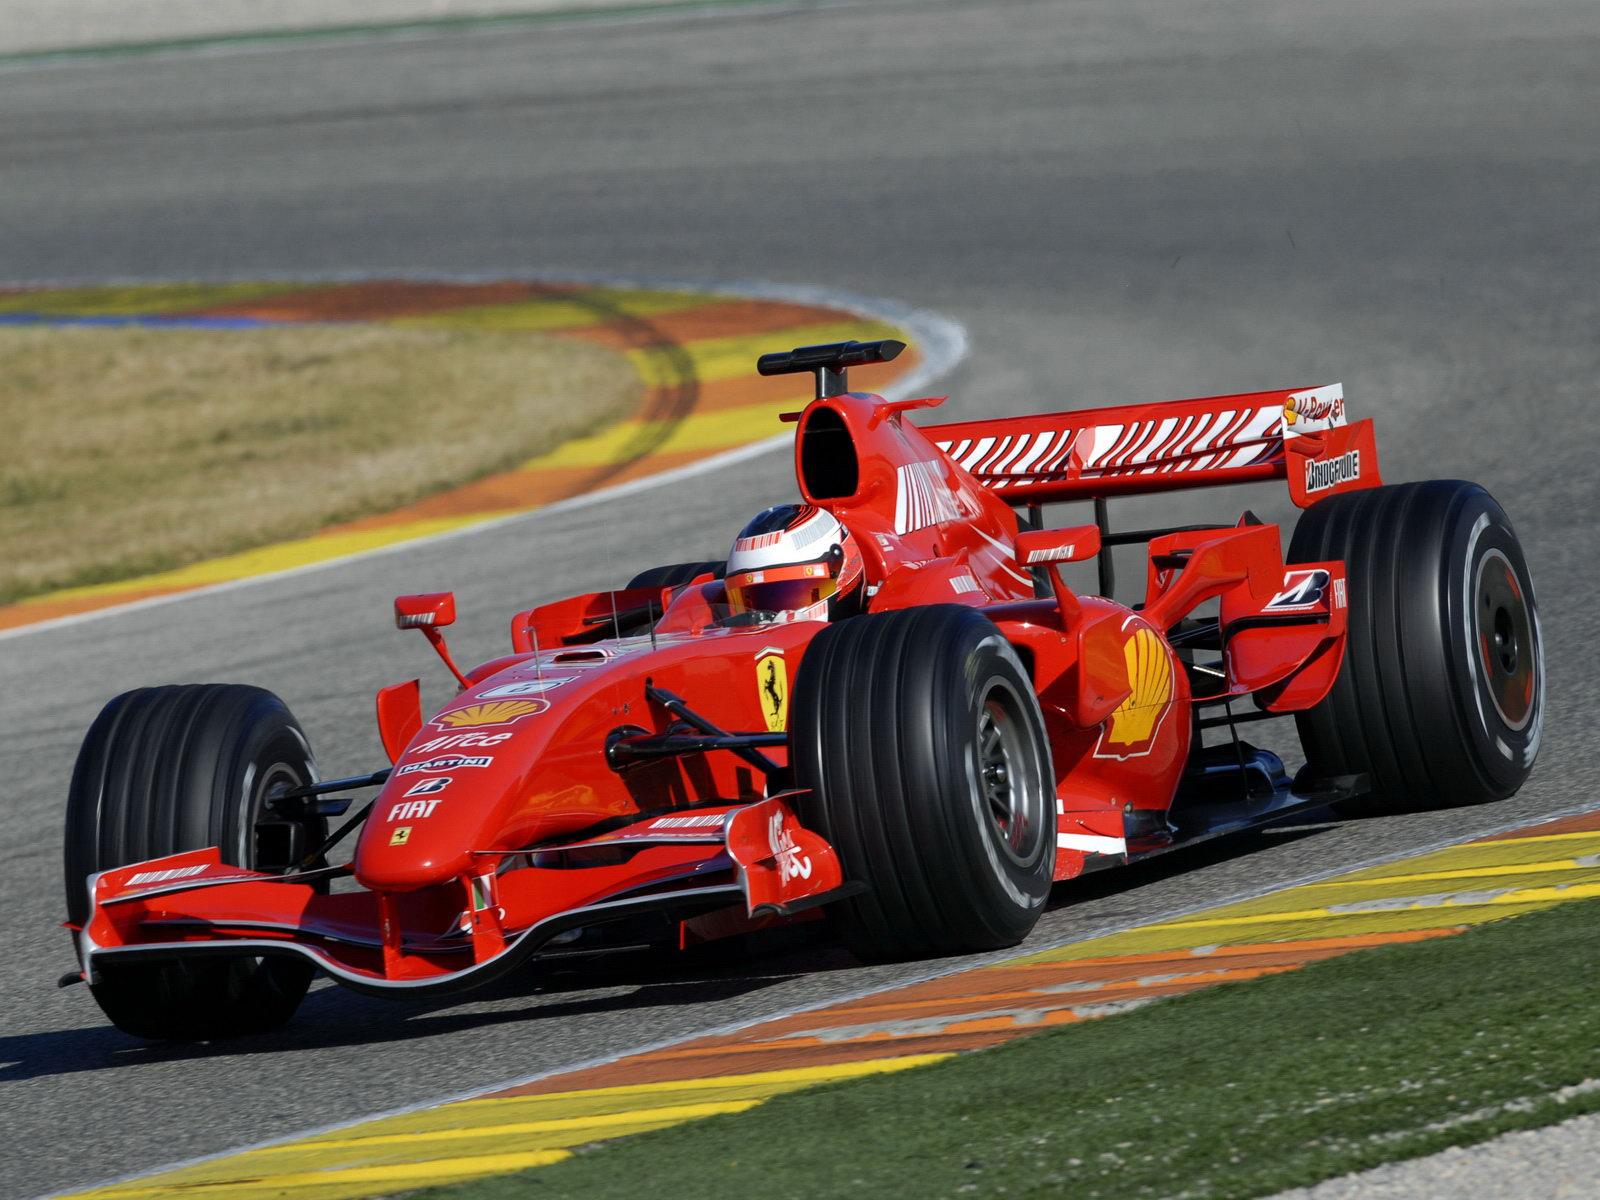 Ferrari F2007 Photos Photogallery With 8 Pics Carsbase Com